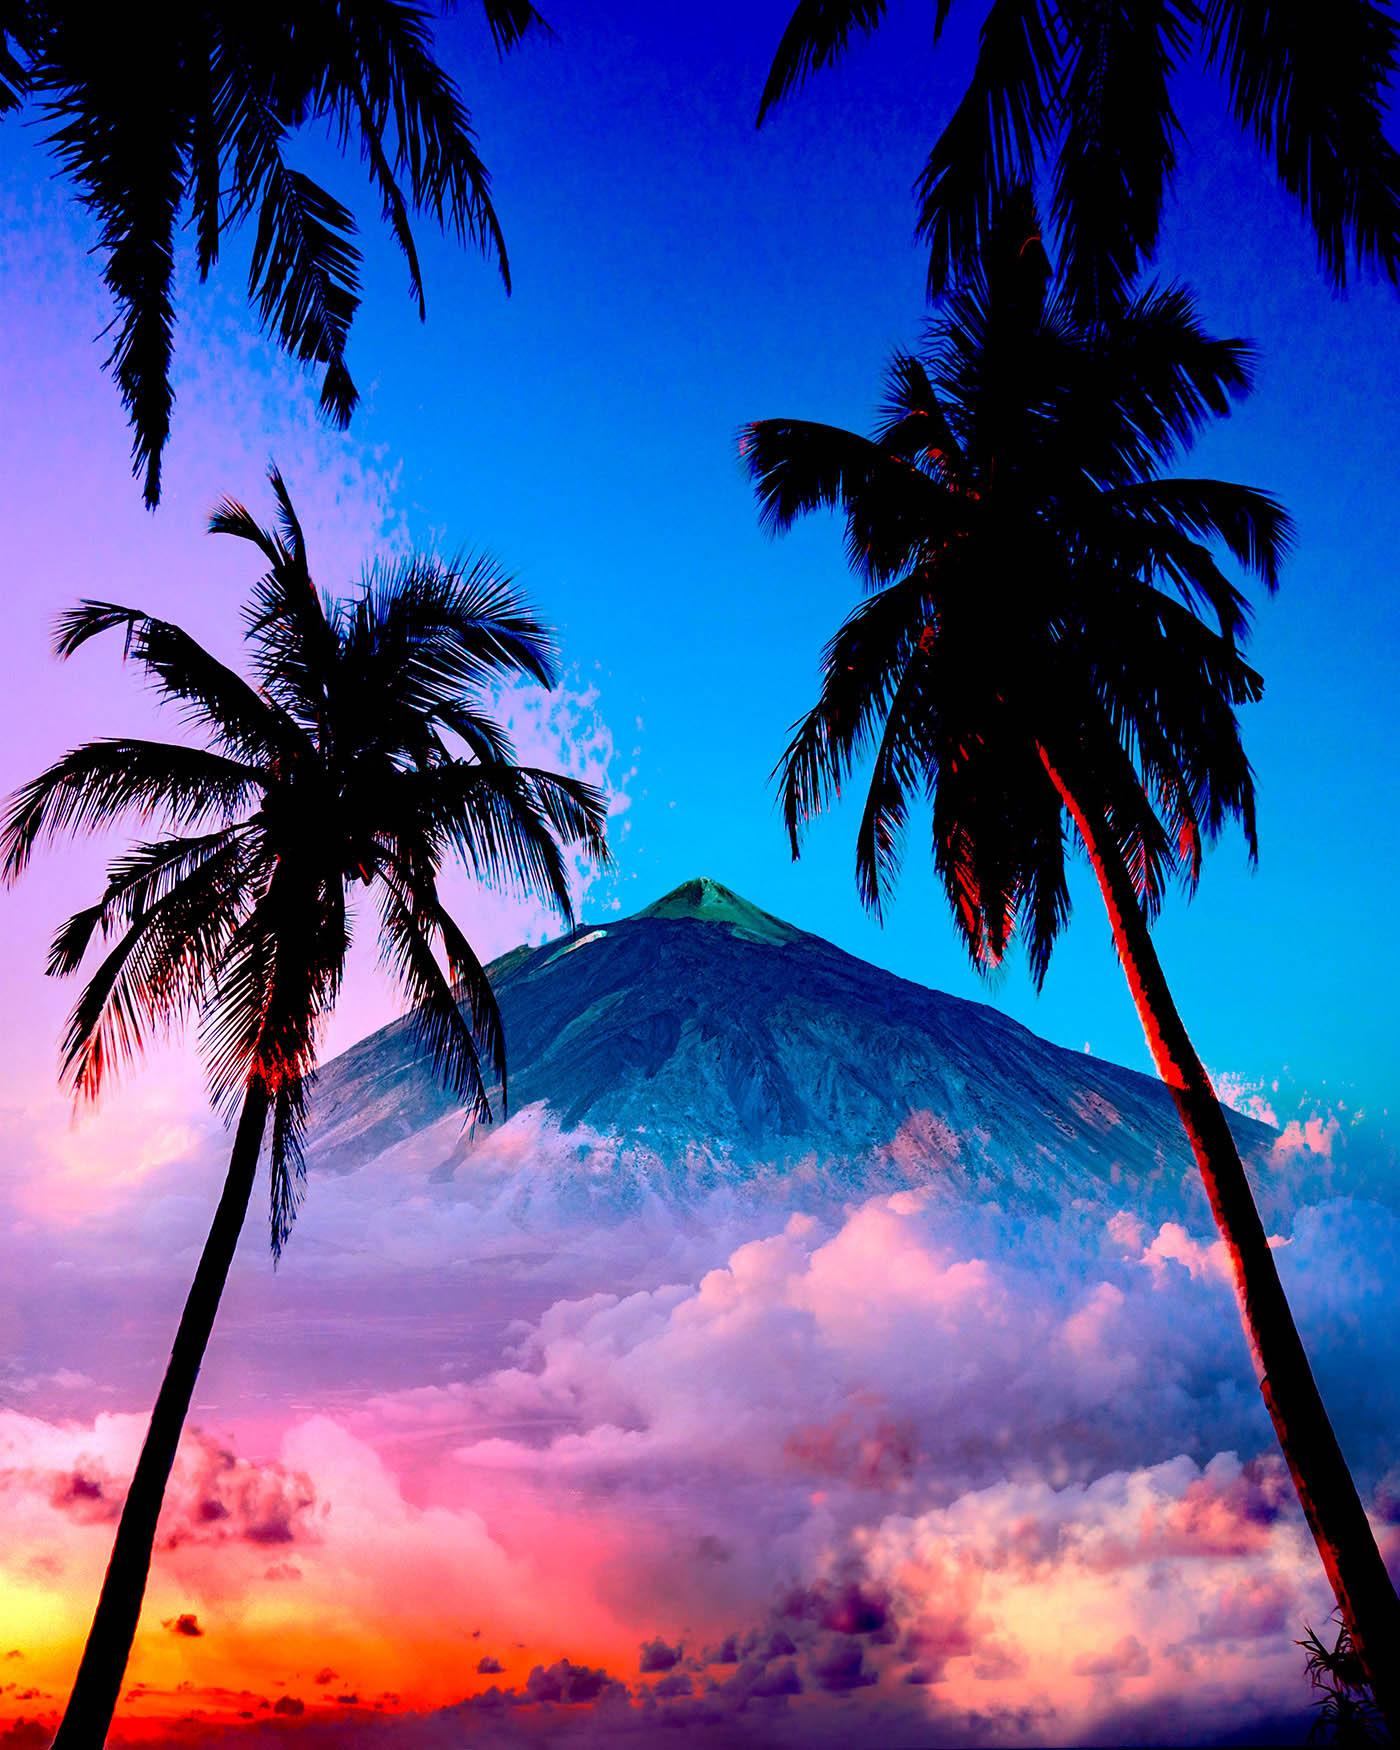 Beautiful Caribbean Paradise 01 - Colorful Stock Photos